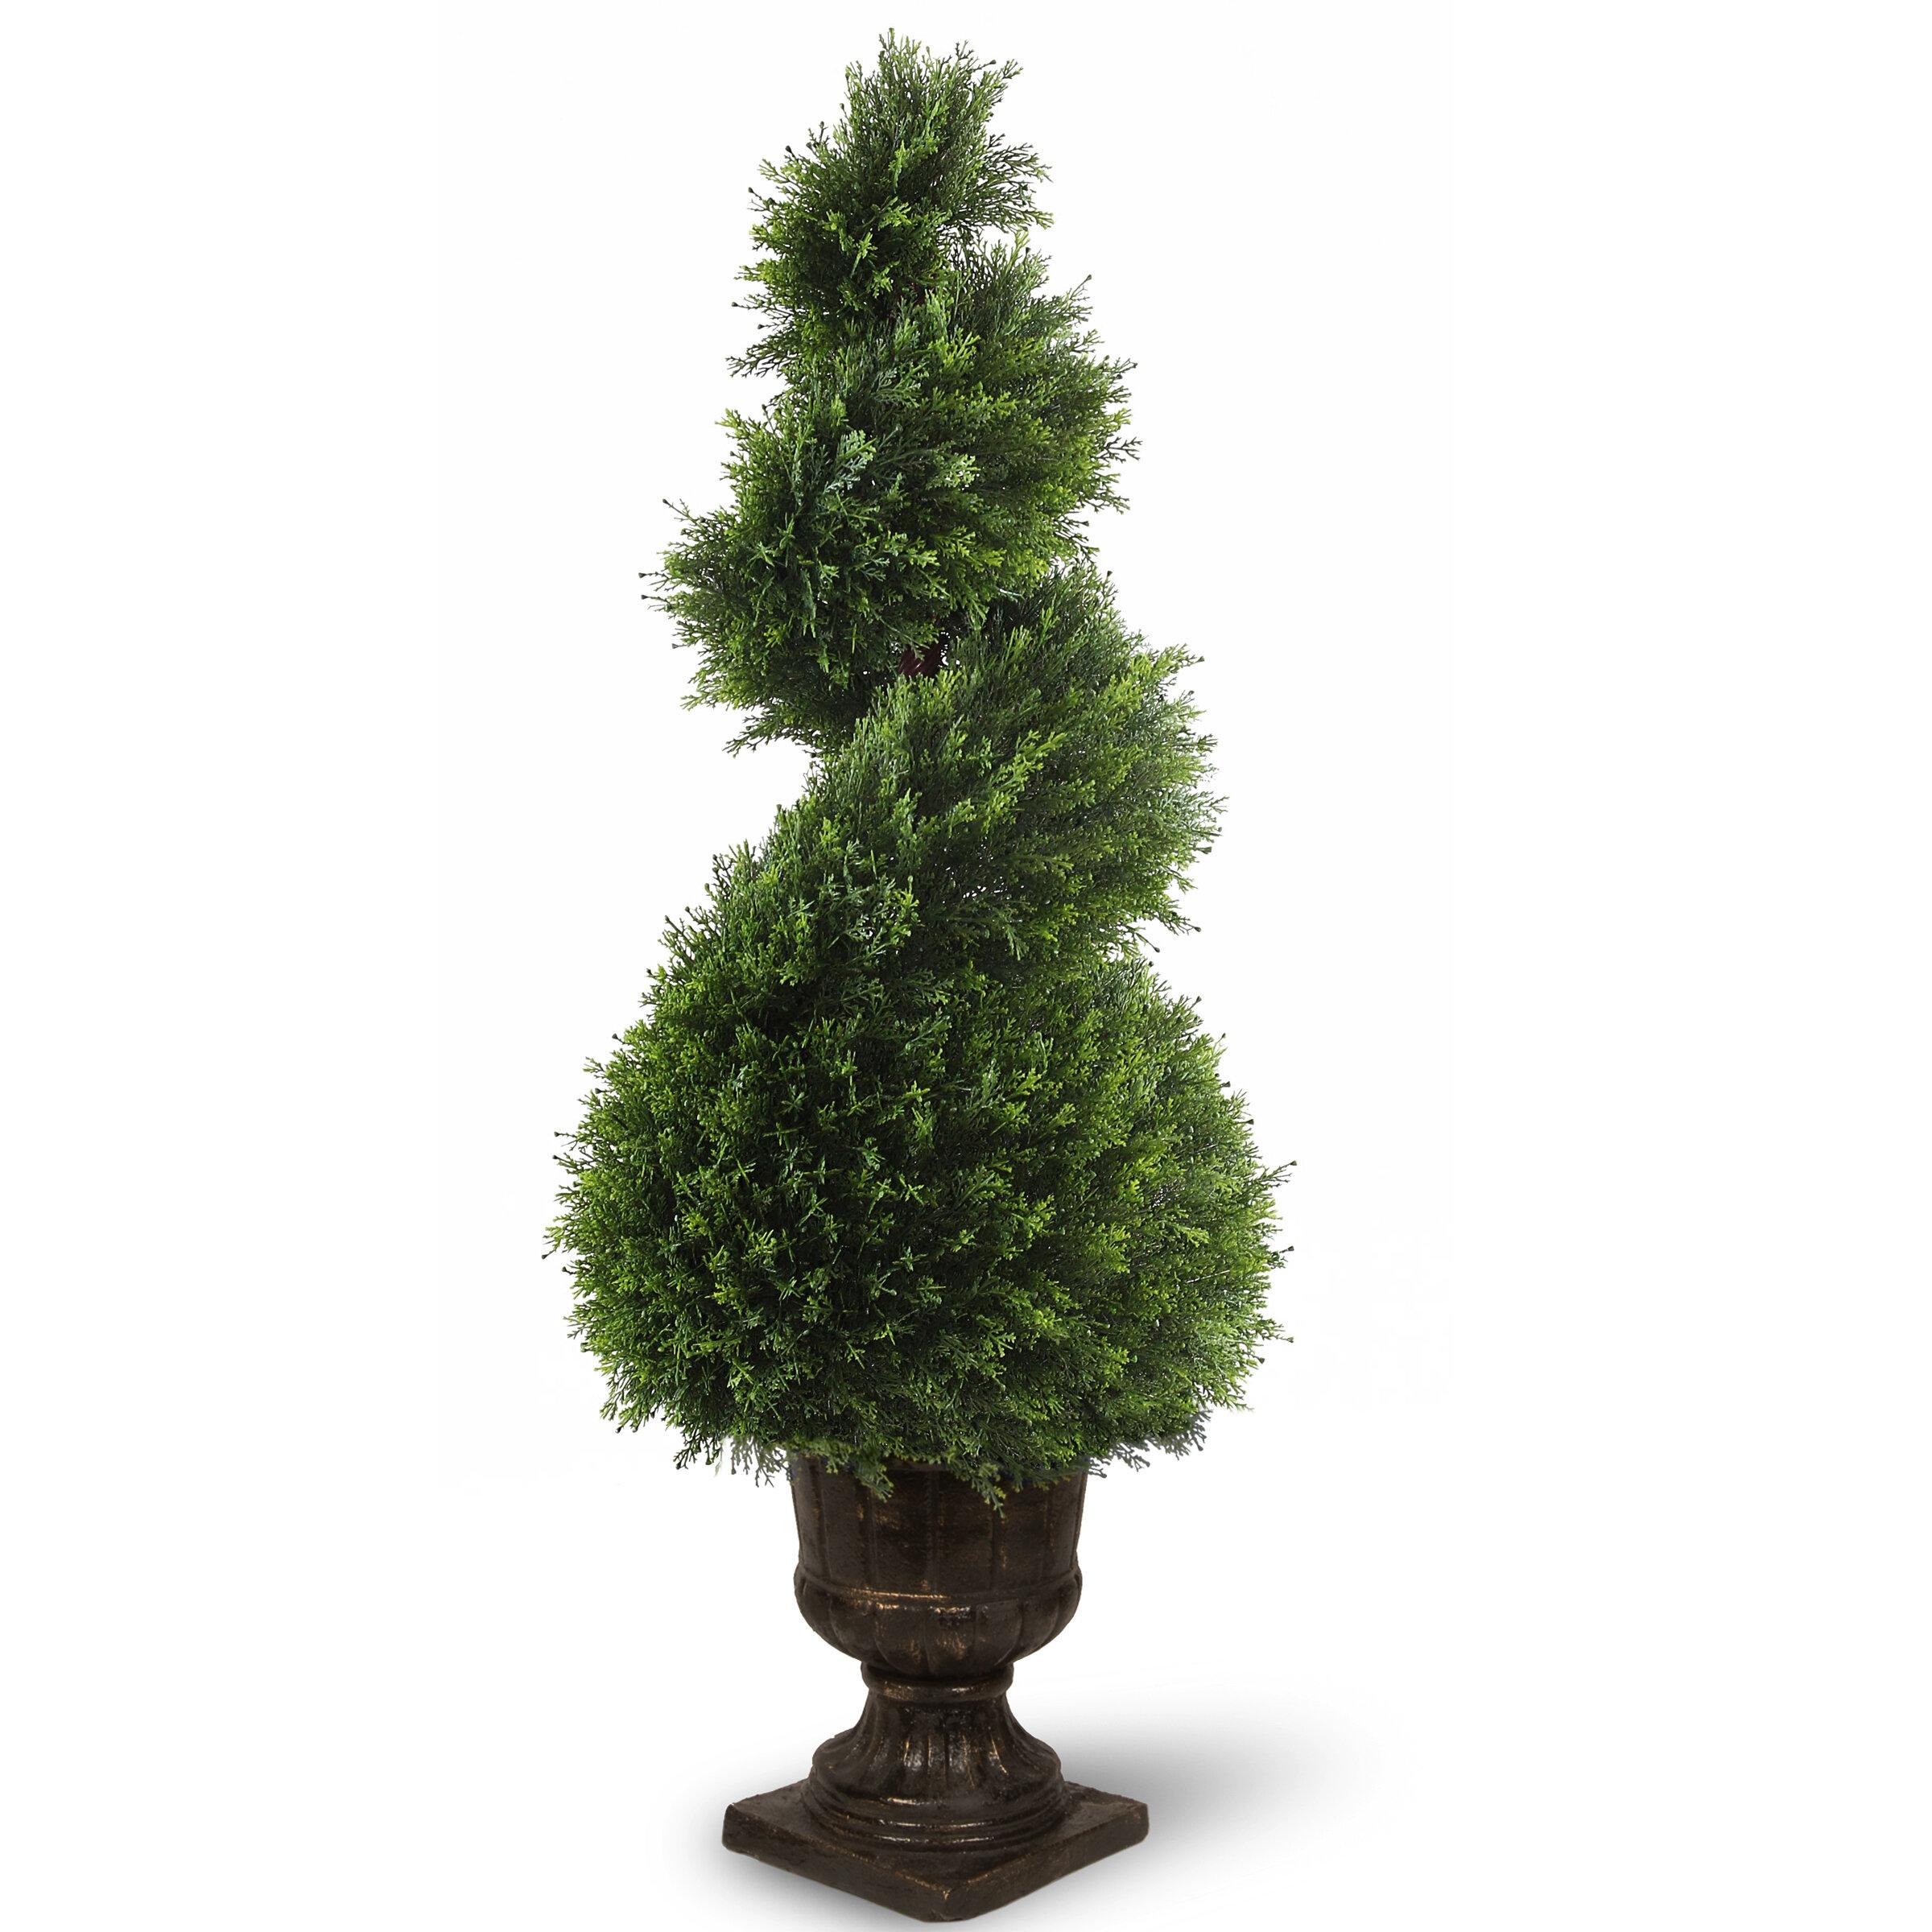 Astoria Grand Floor Moss Topiary In Urn Reviews Wayfair